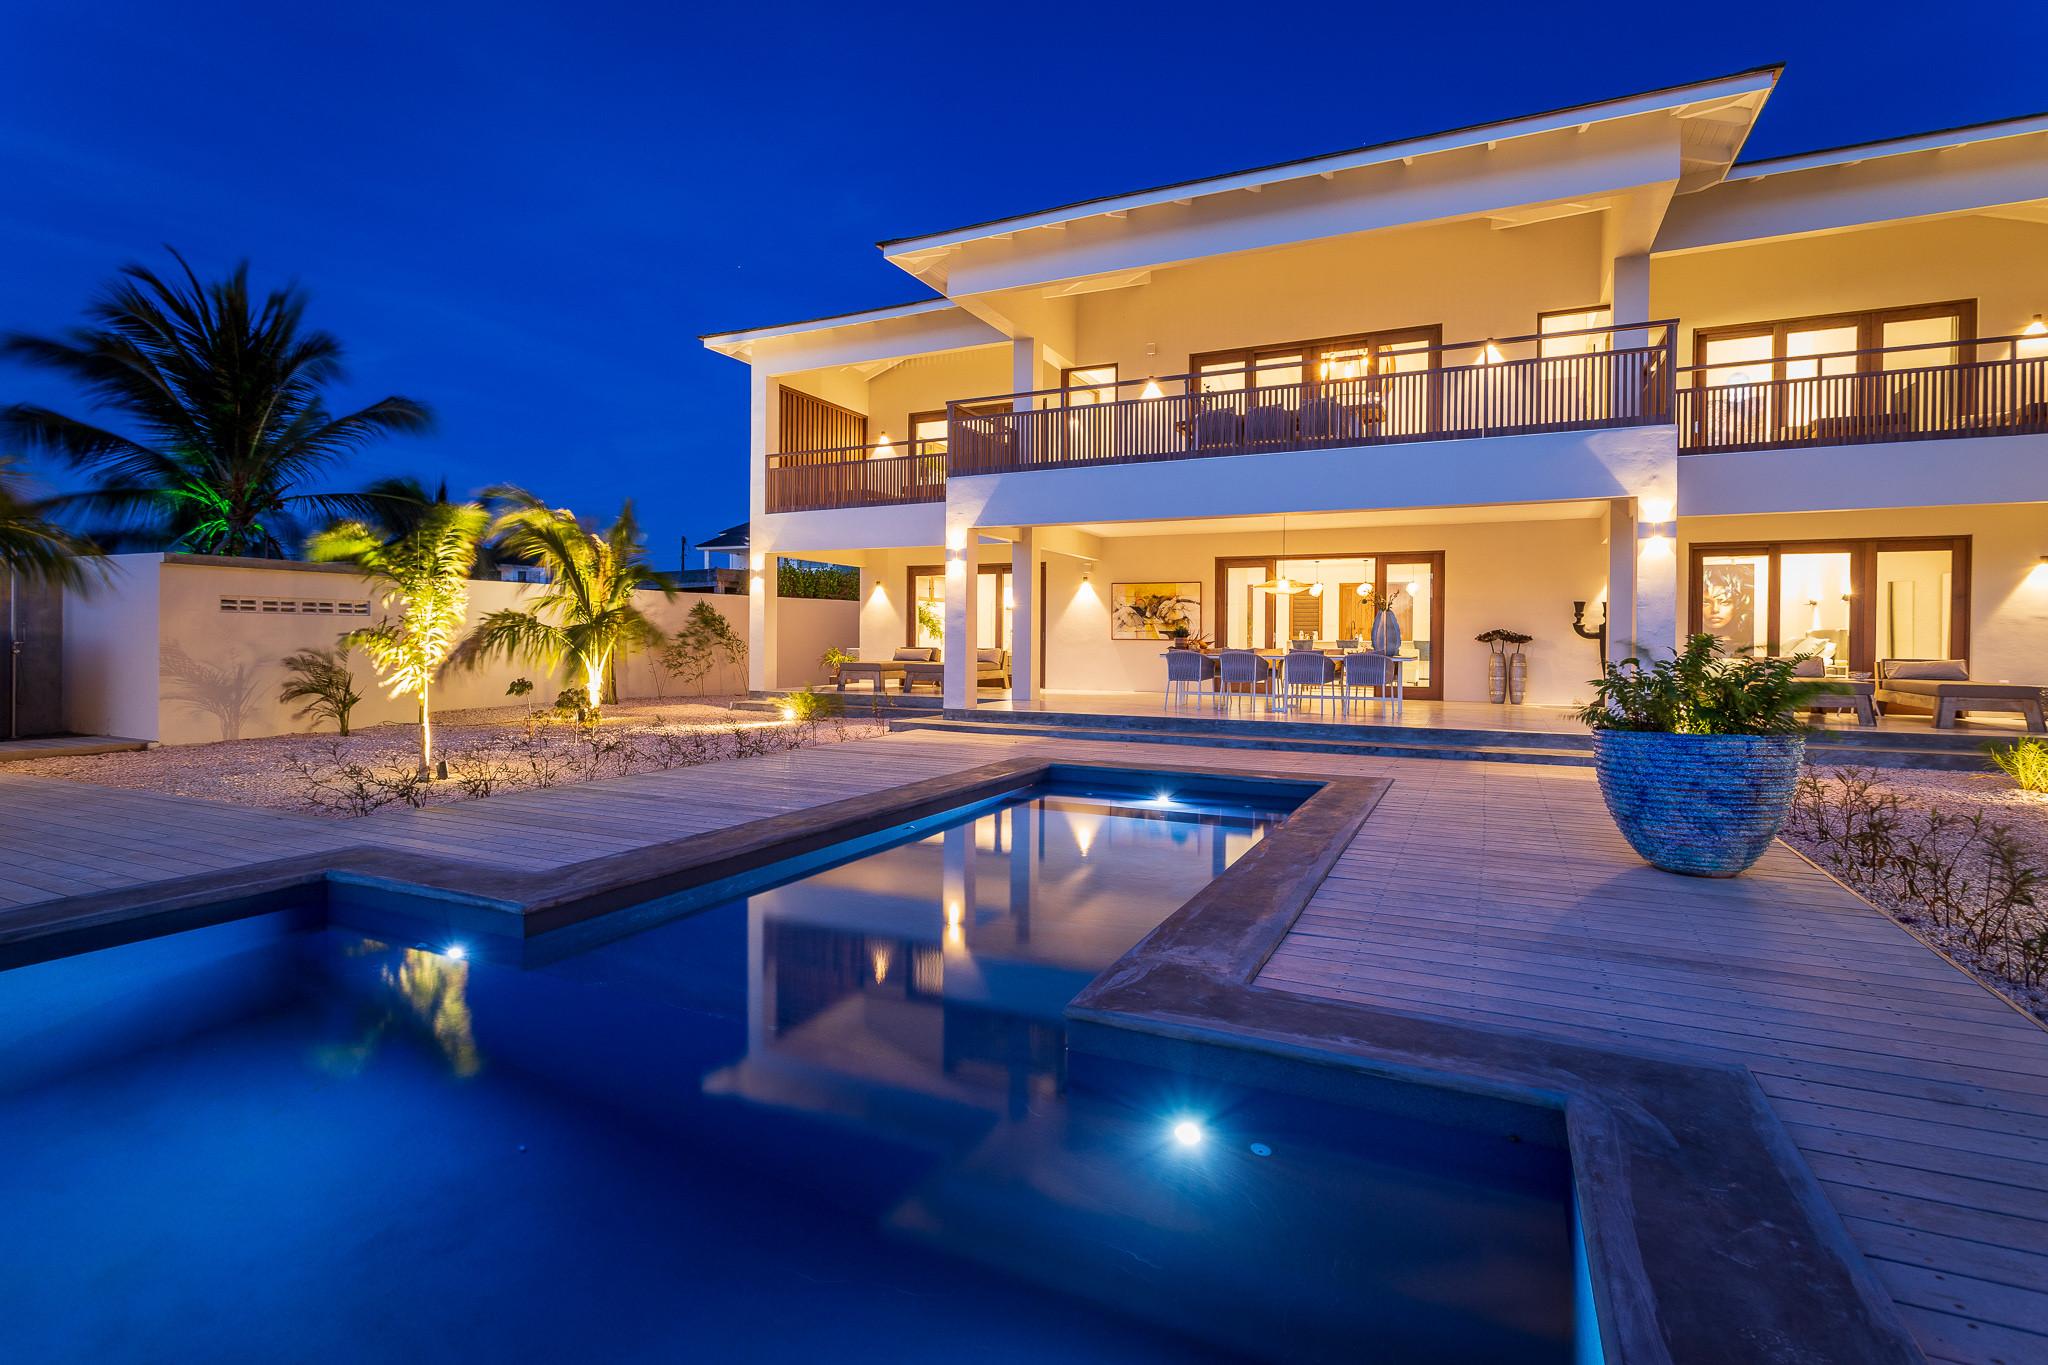 Premium Real Estate Photo Package